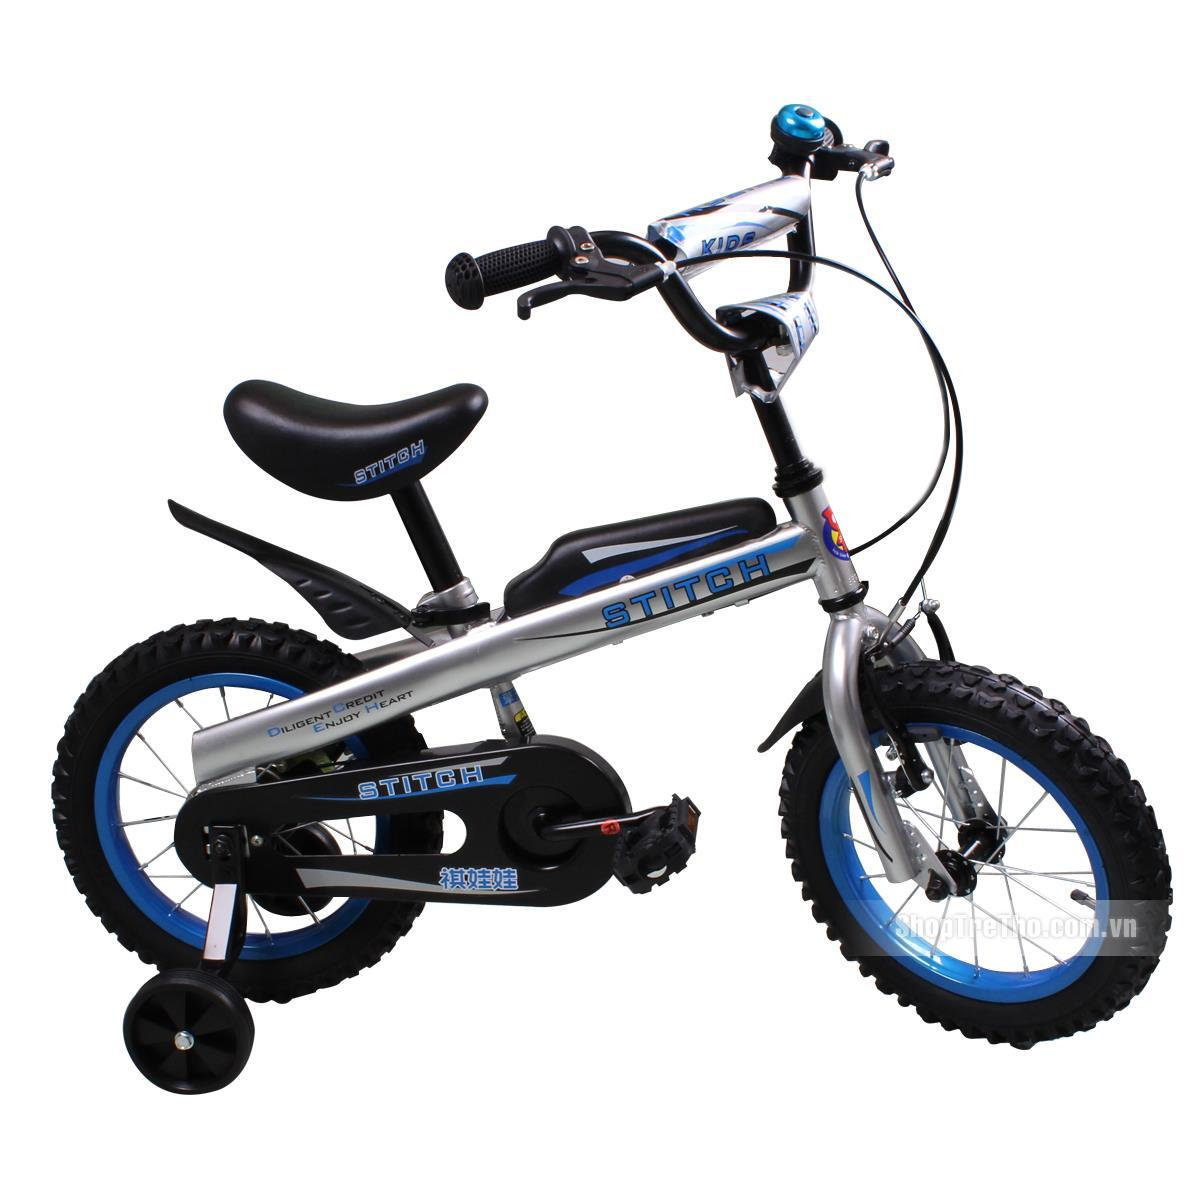 Xe đạp trẻ em Stitch JK 903 16 inch